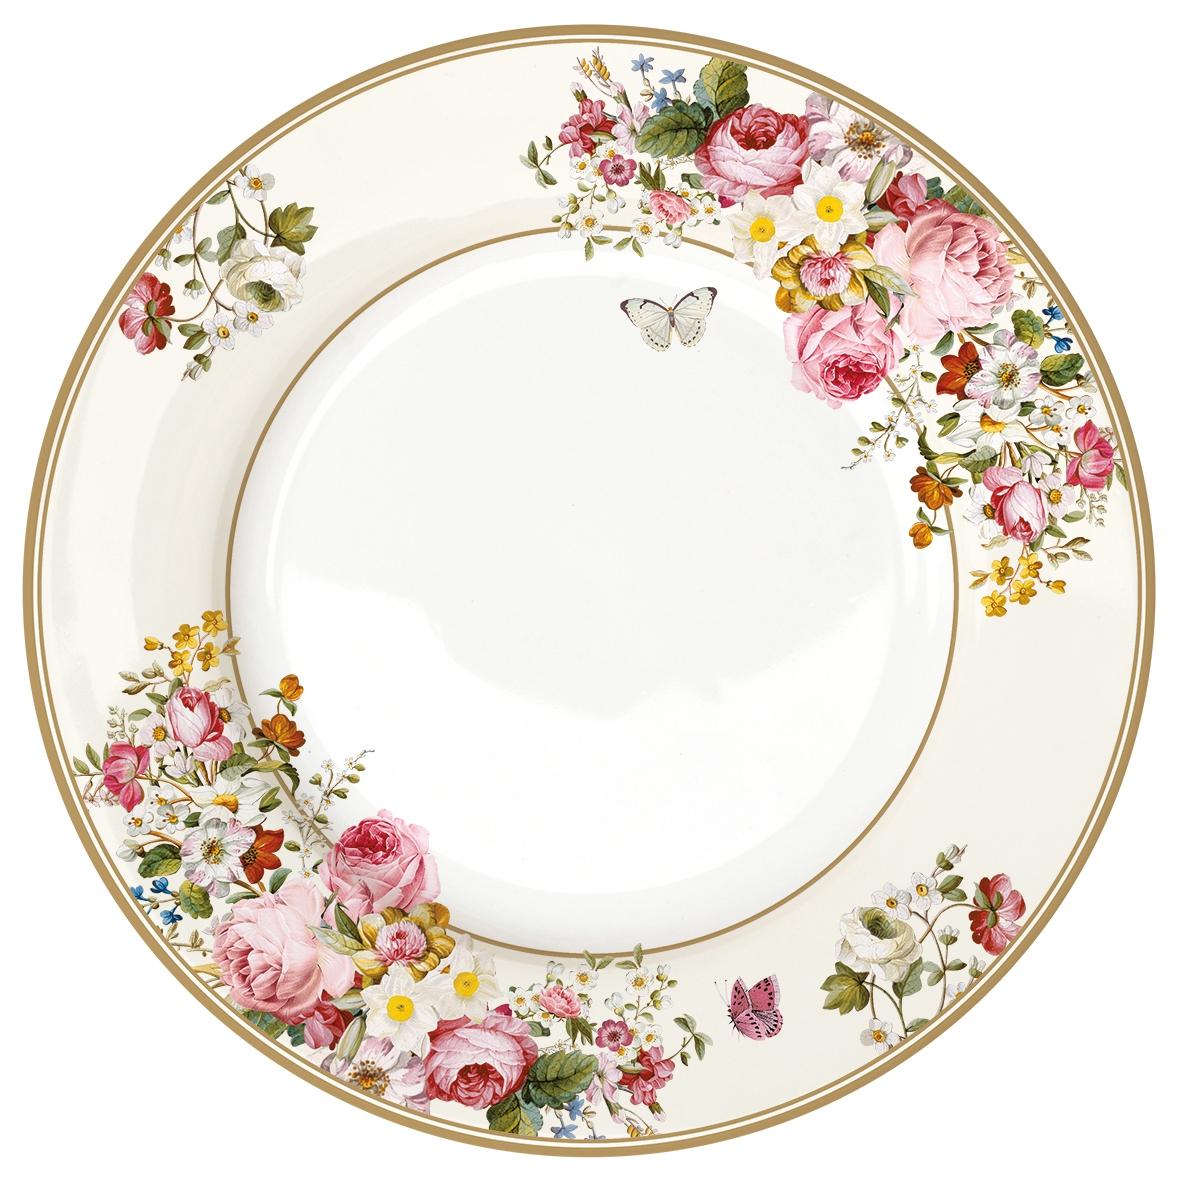 Feeding plate 27cm - Blooming Opulence